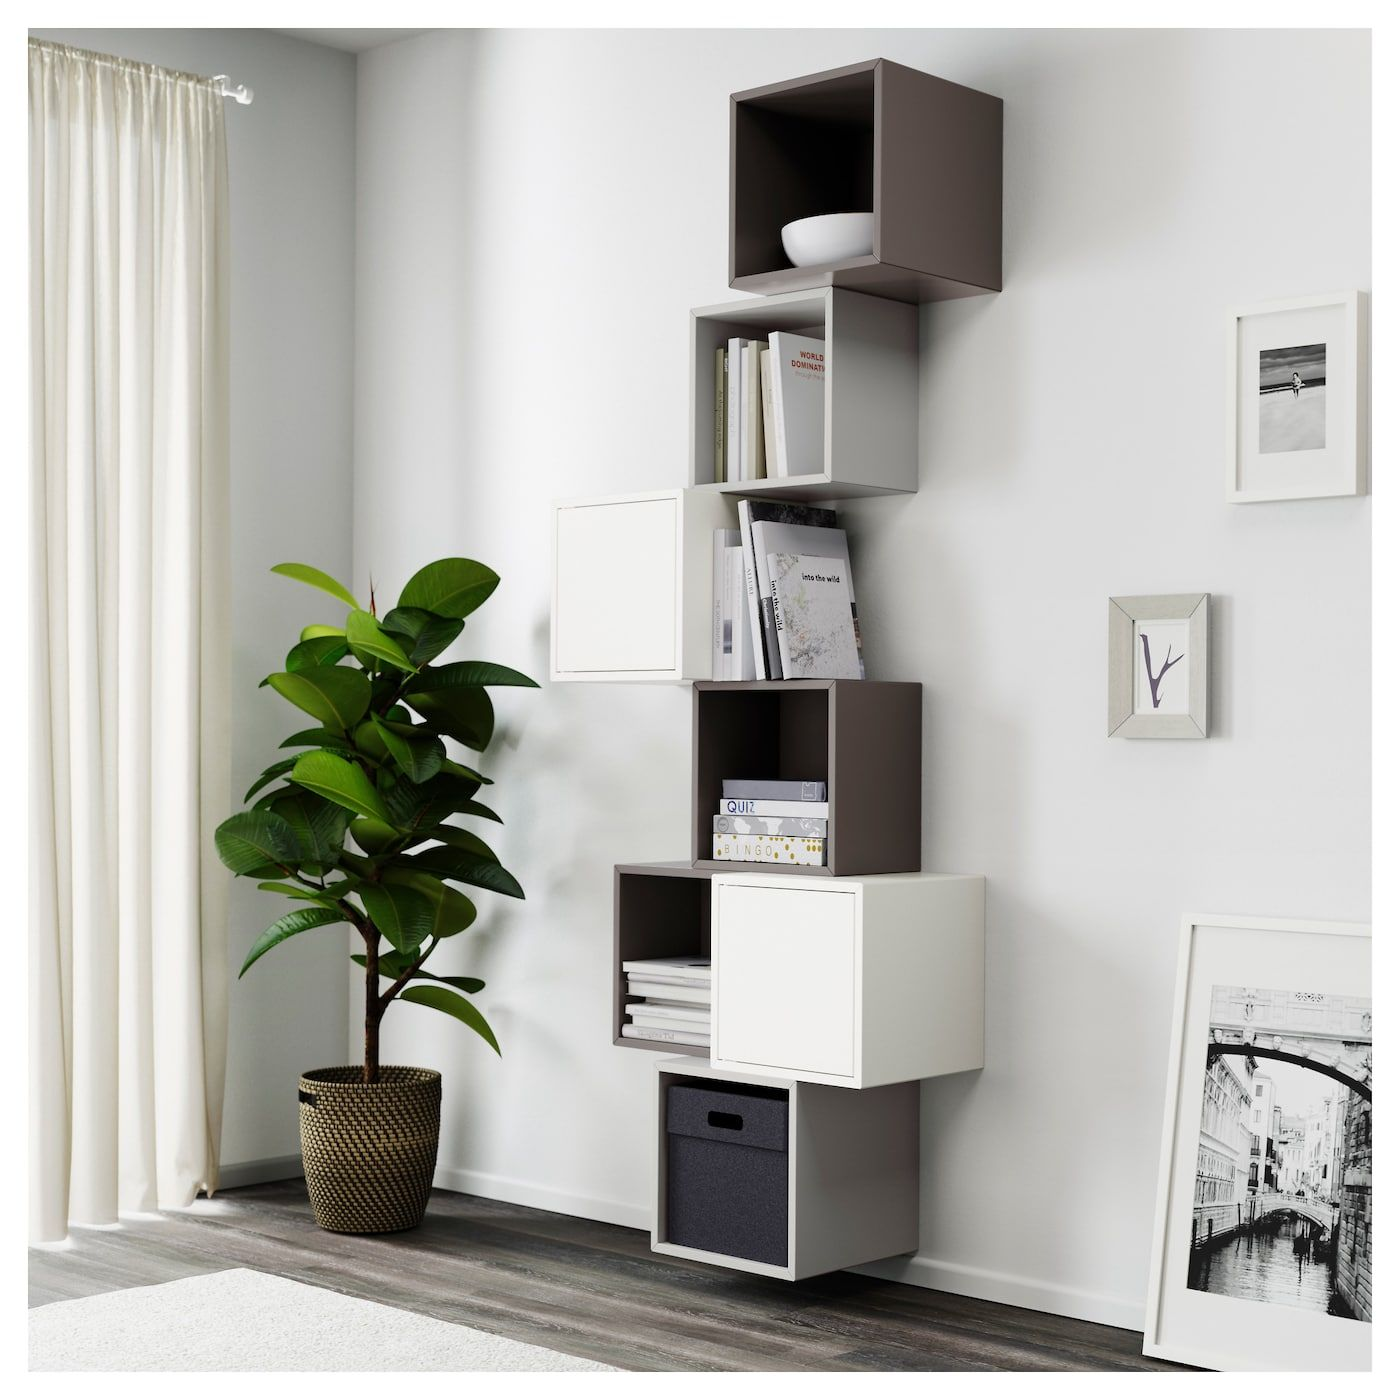 IKEA EKET White/dark Gray, Light Gray Wall-mounted Cabinet